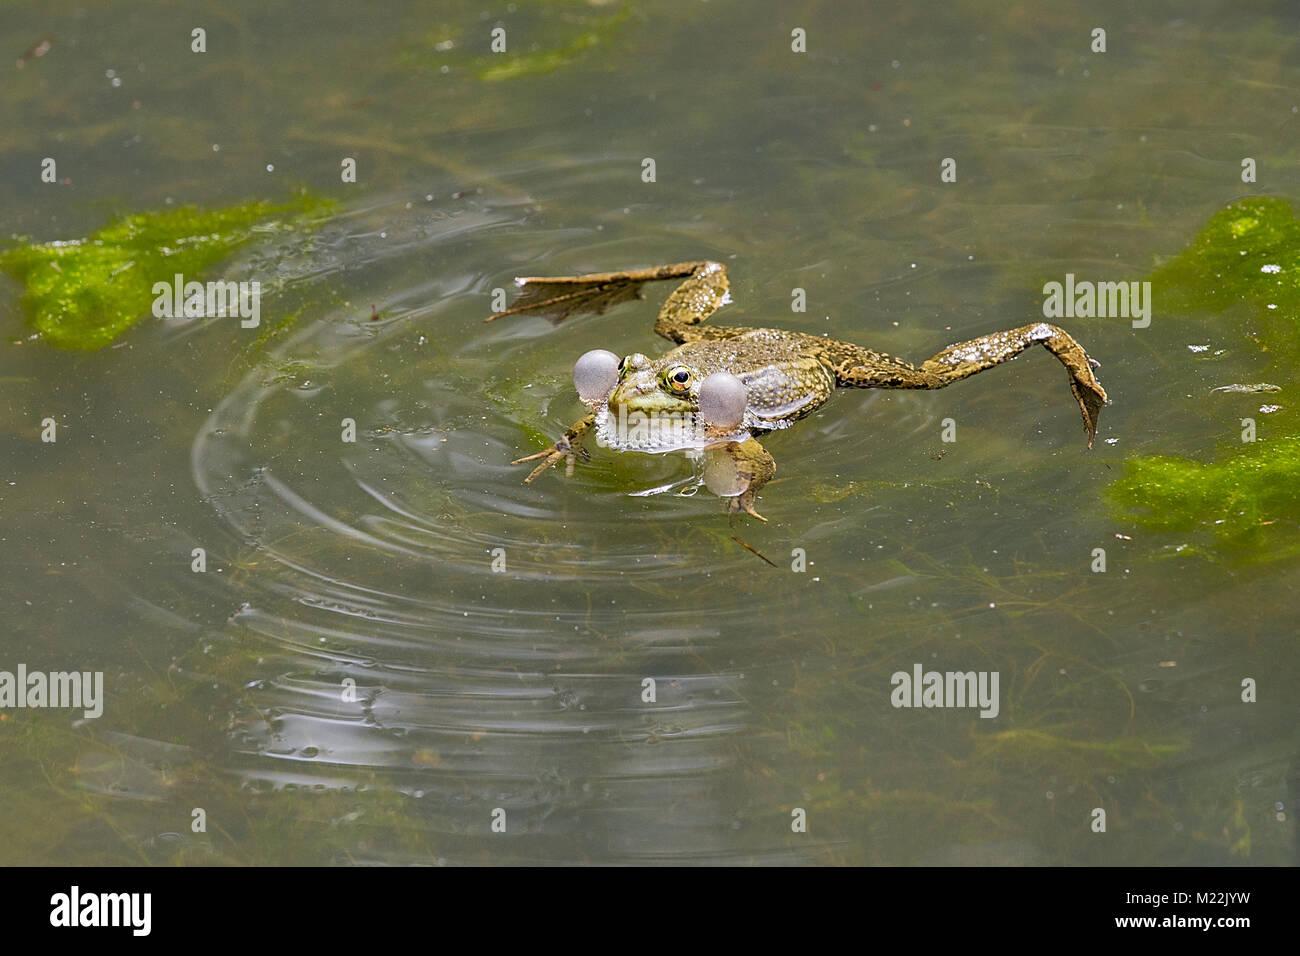 Green frog (Rana dalmatina) - Croaking frog with balloons in water - Stock Image